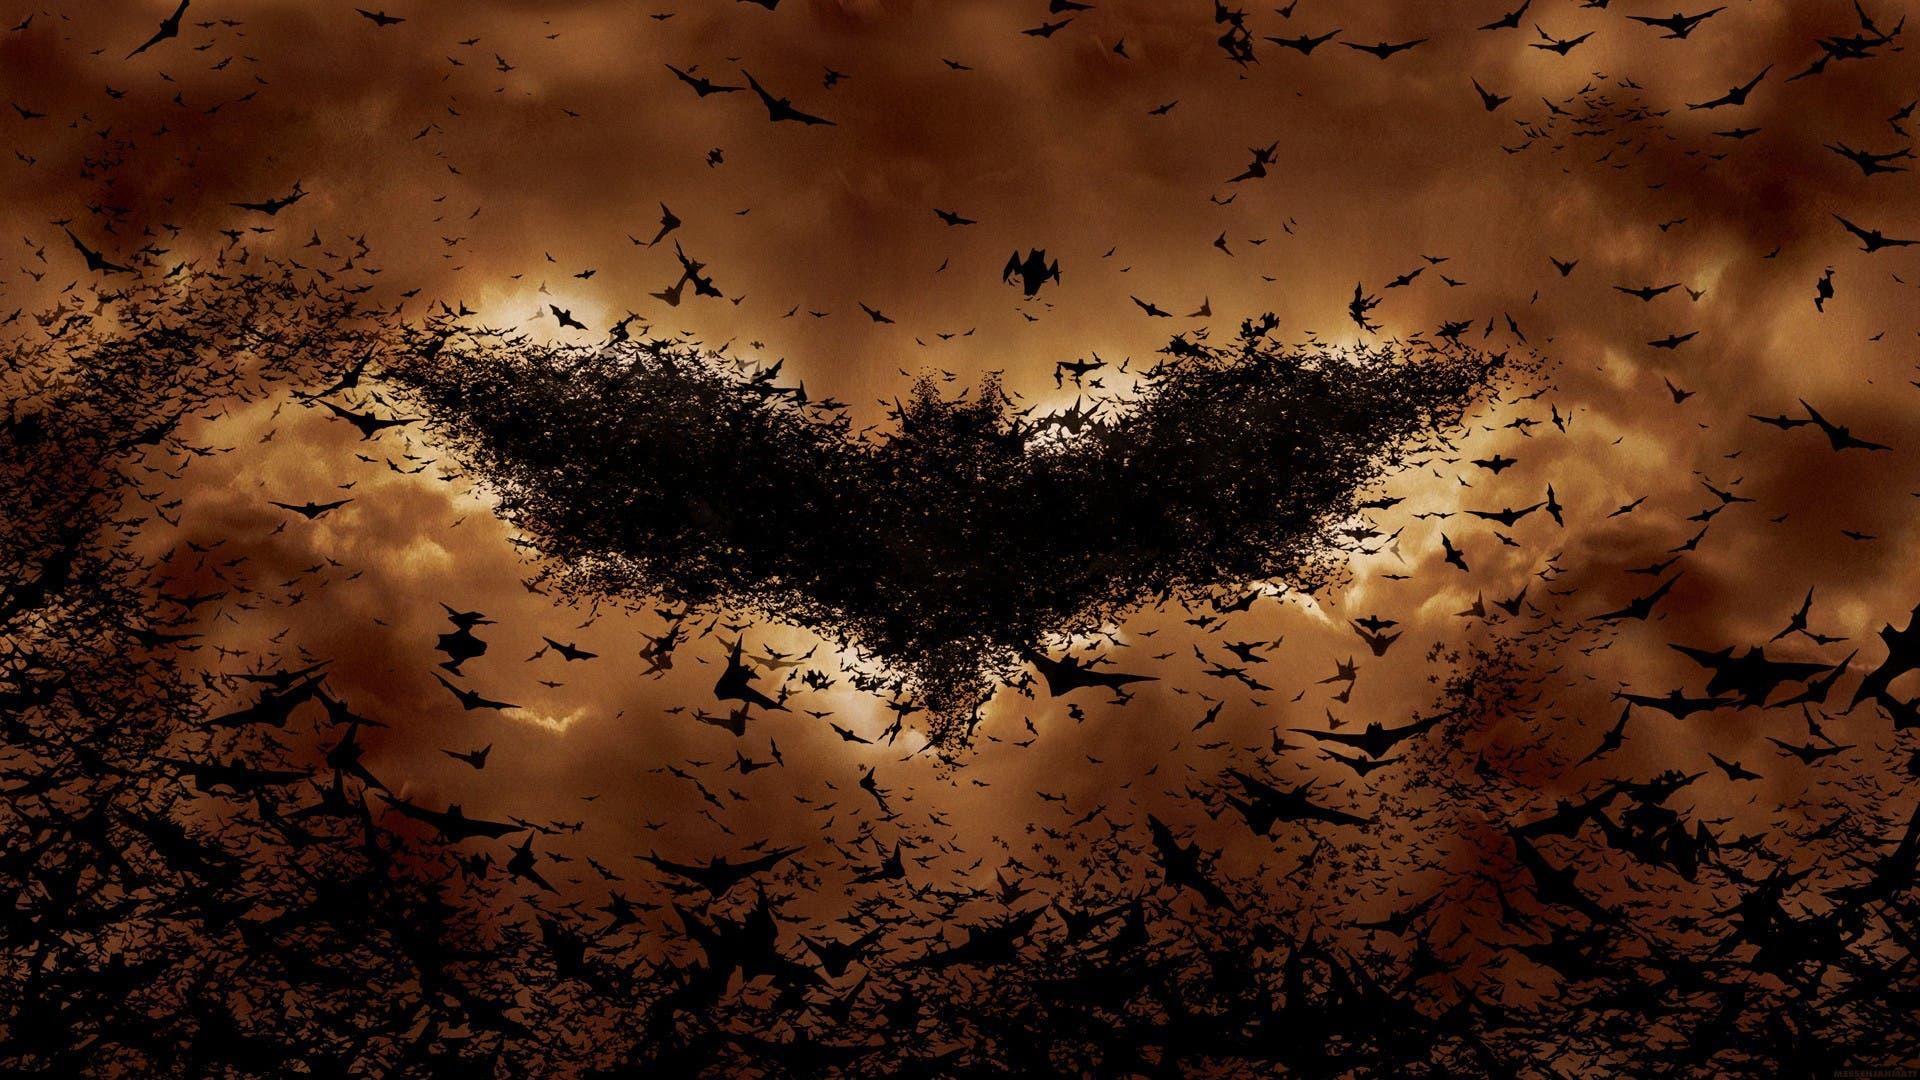 Batman Begins (Batman Day 2)